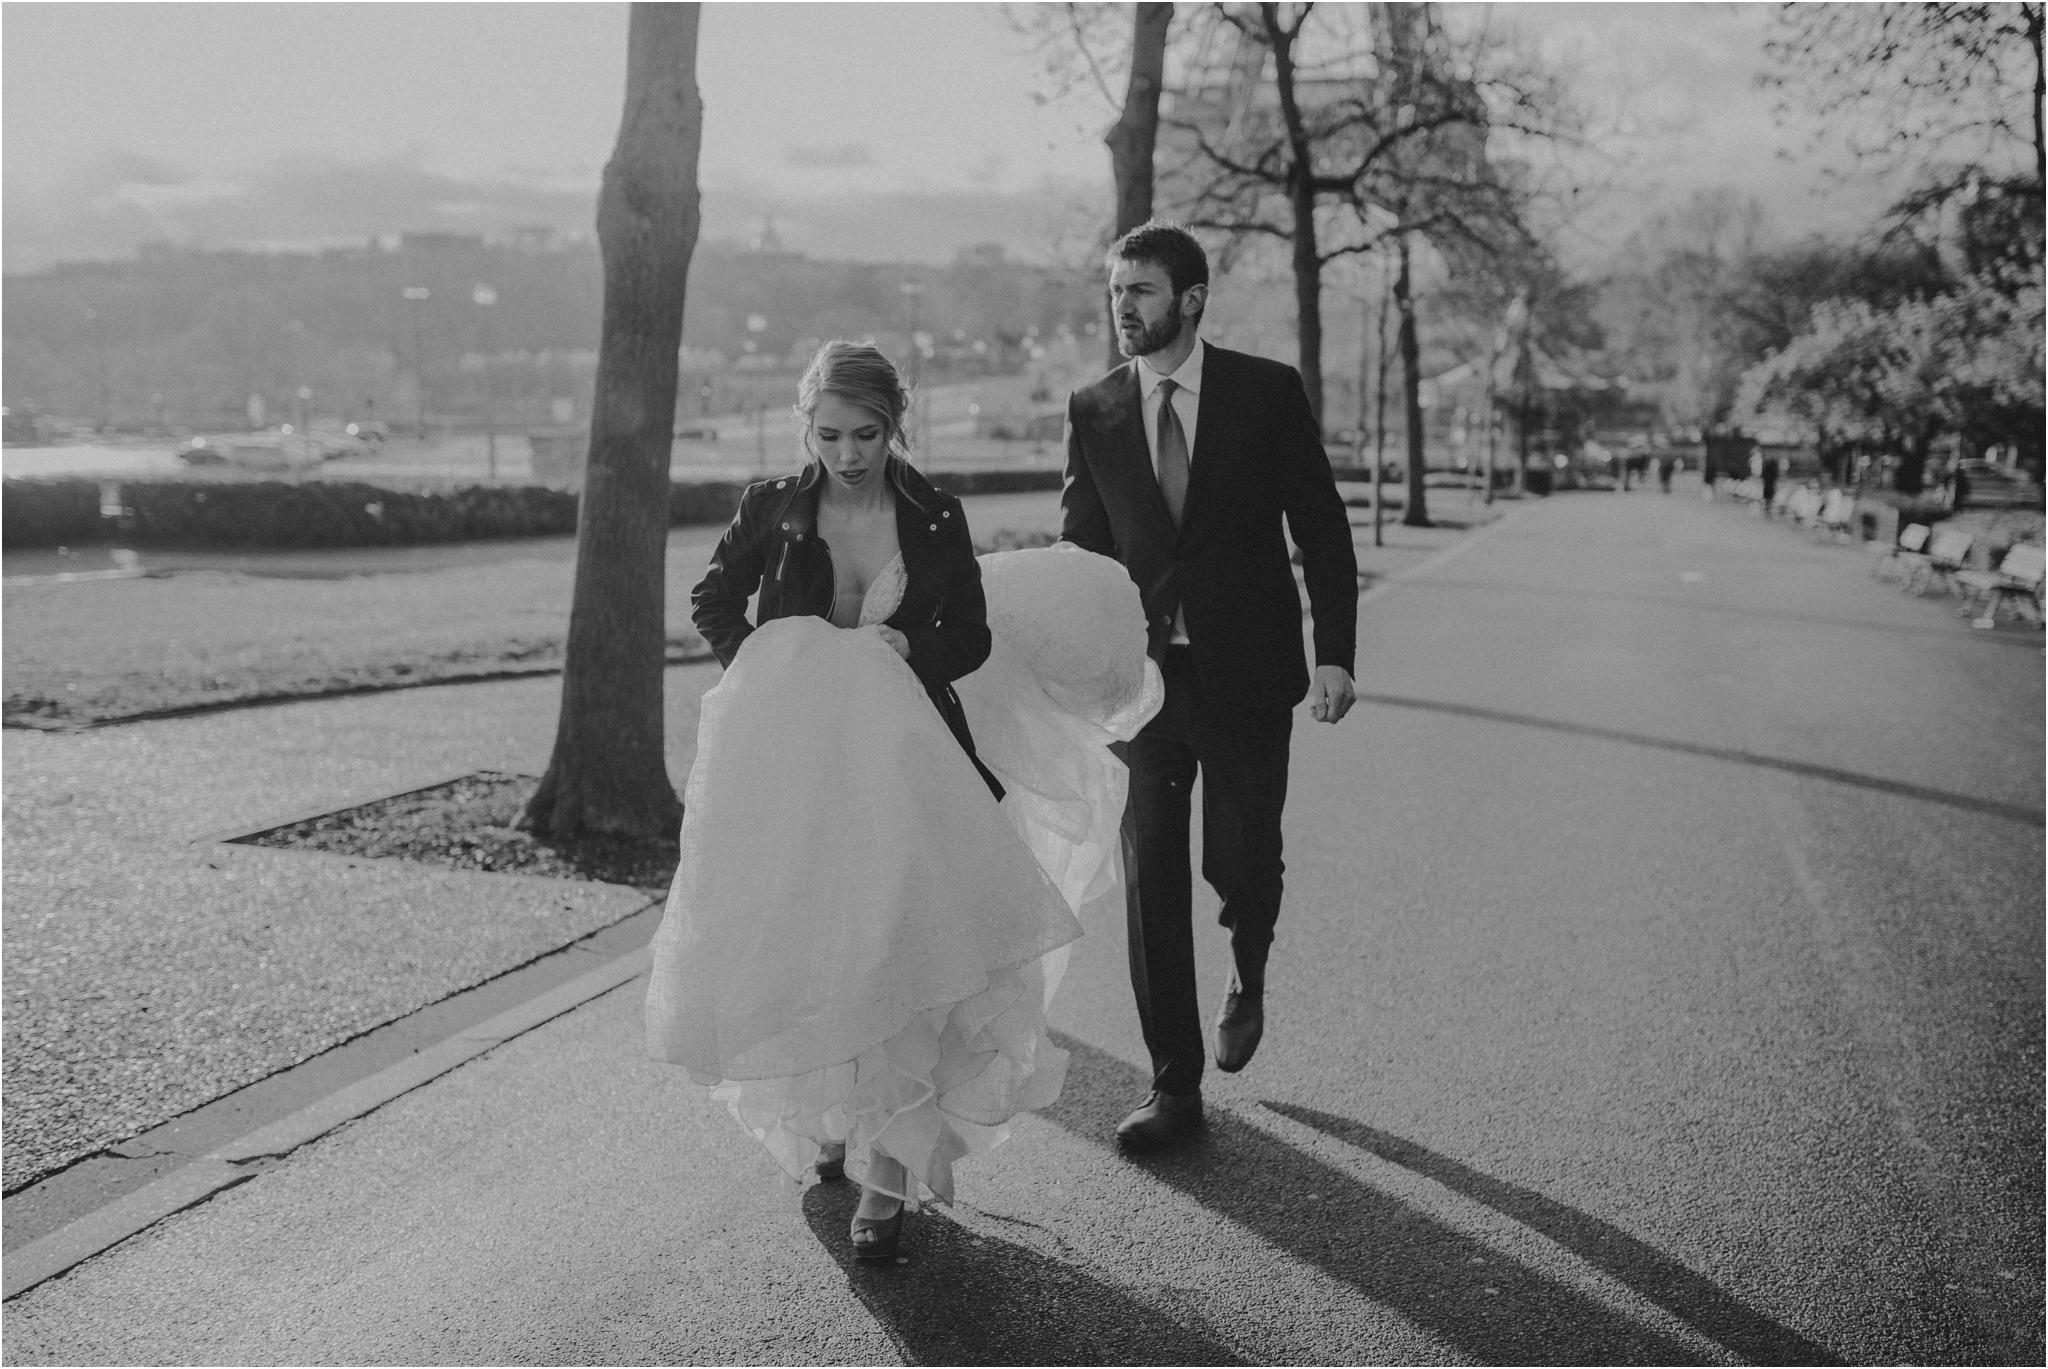 miranda-and-jared-paris-elopement-destination-wedding-photographer-044.jpg